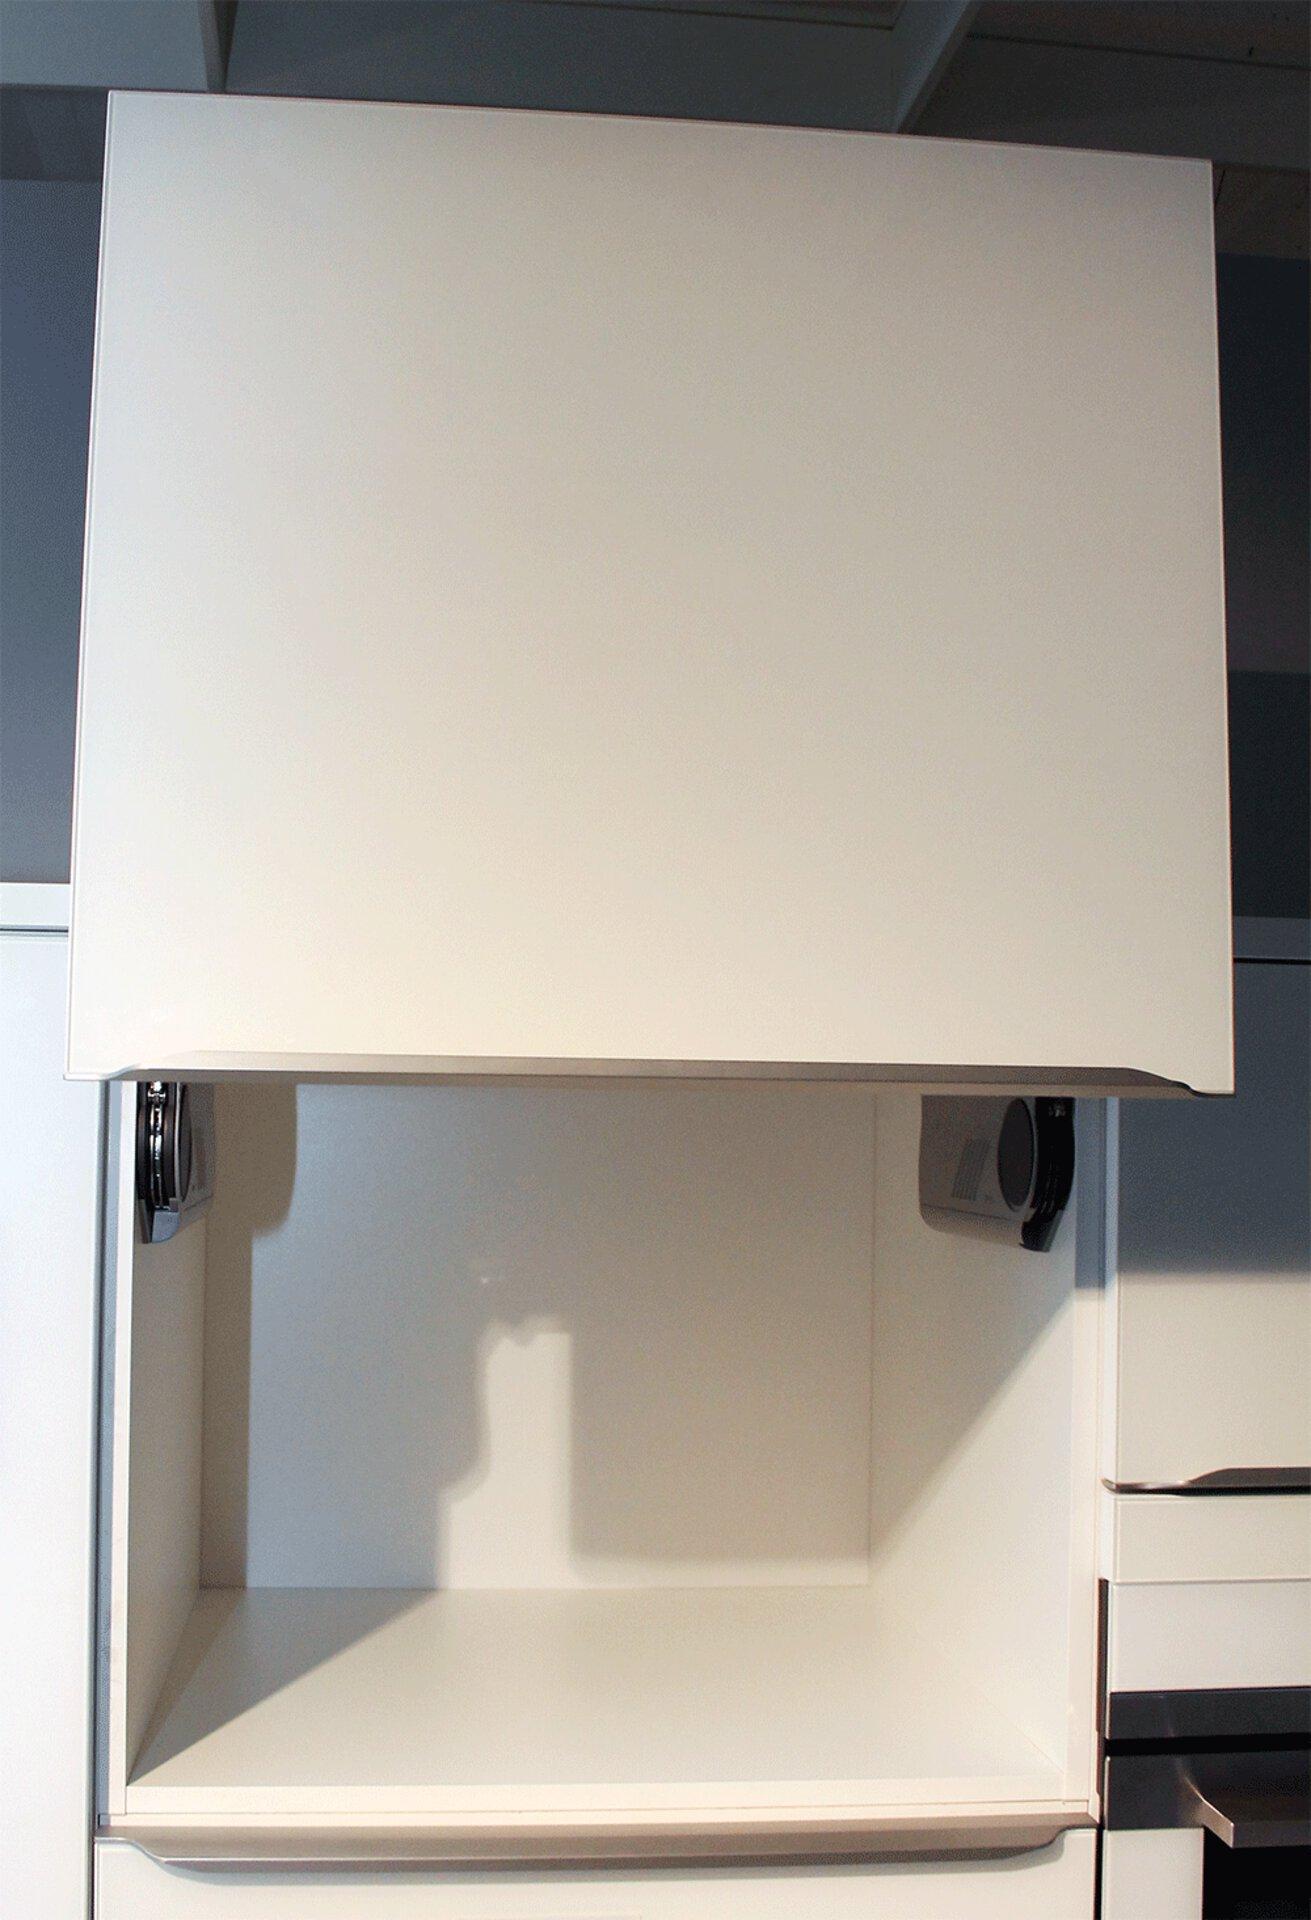 Rom Küchenblock bauformat